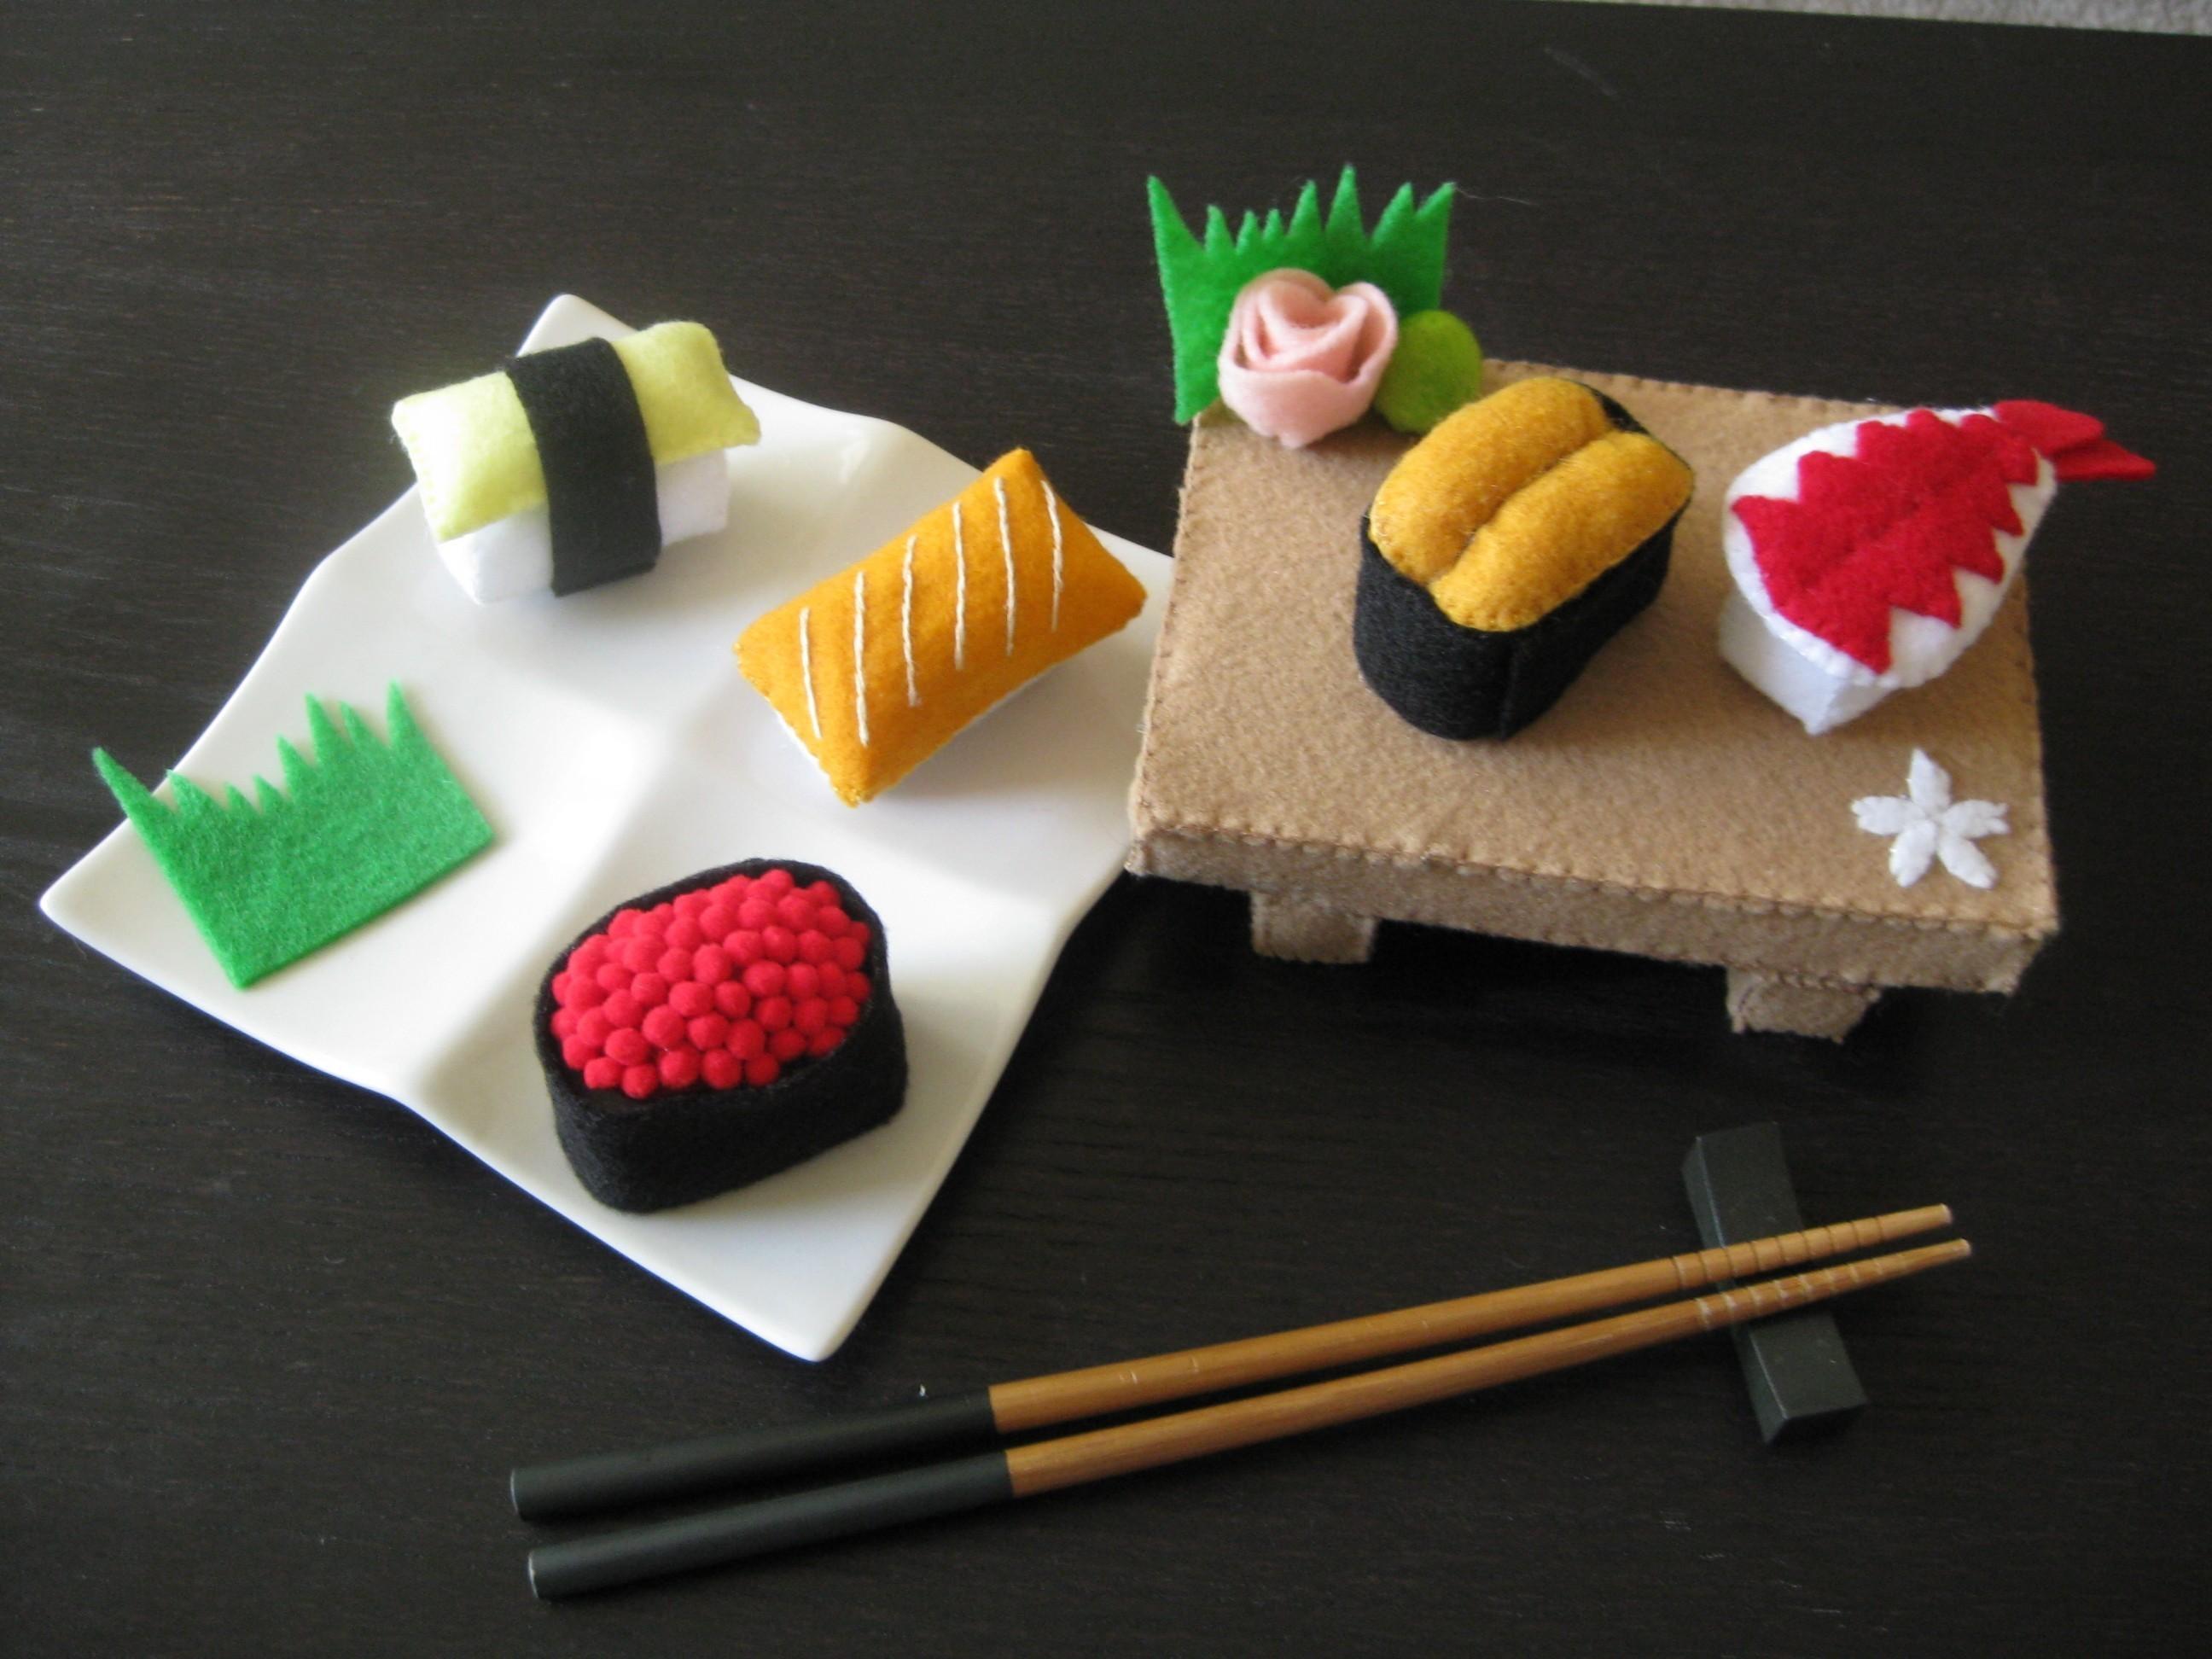 Plush Food Toys : Plush food and art last one eating